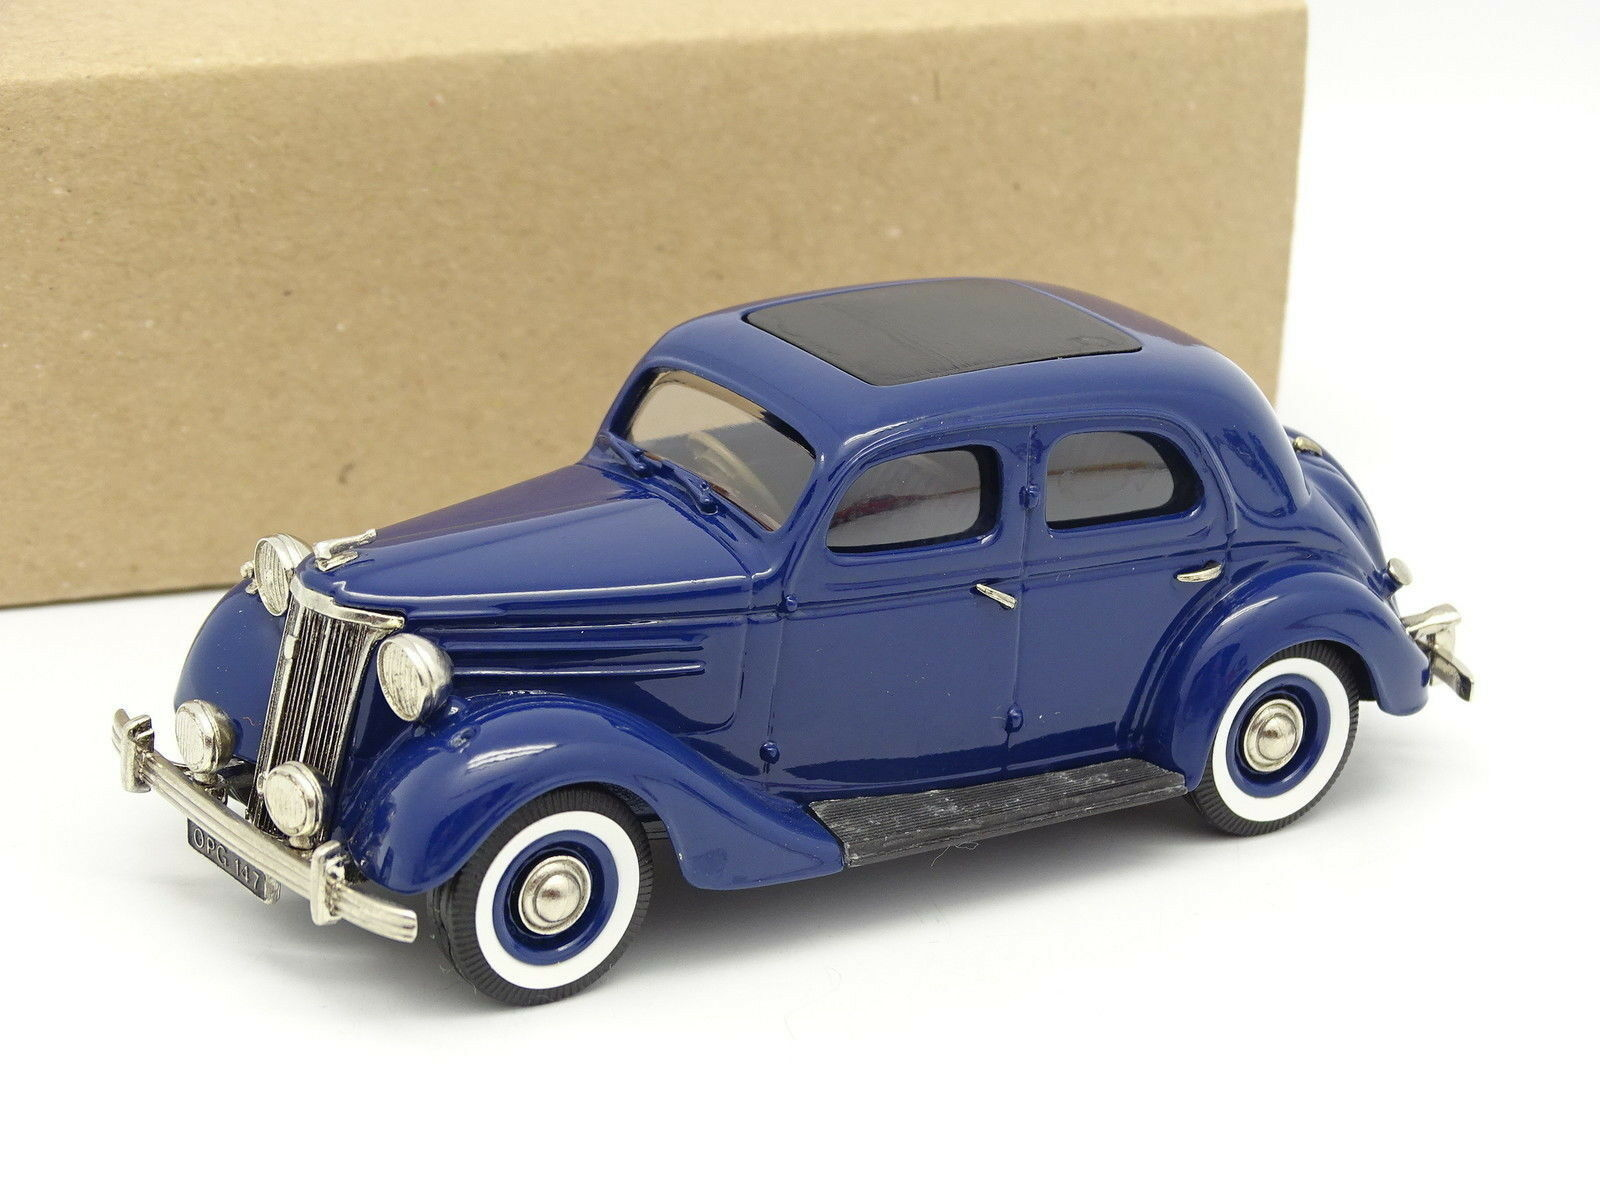 Lawsdowne Modelos SB 1 43 - Ford V8 Pilot 1948 blu